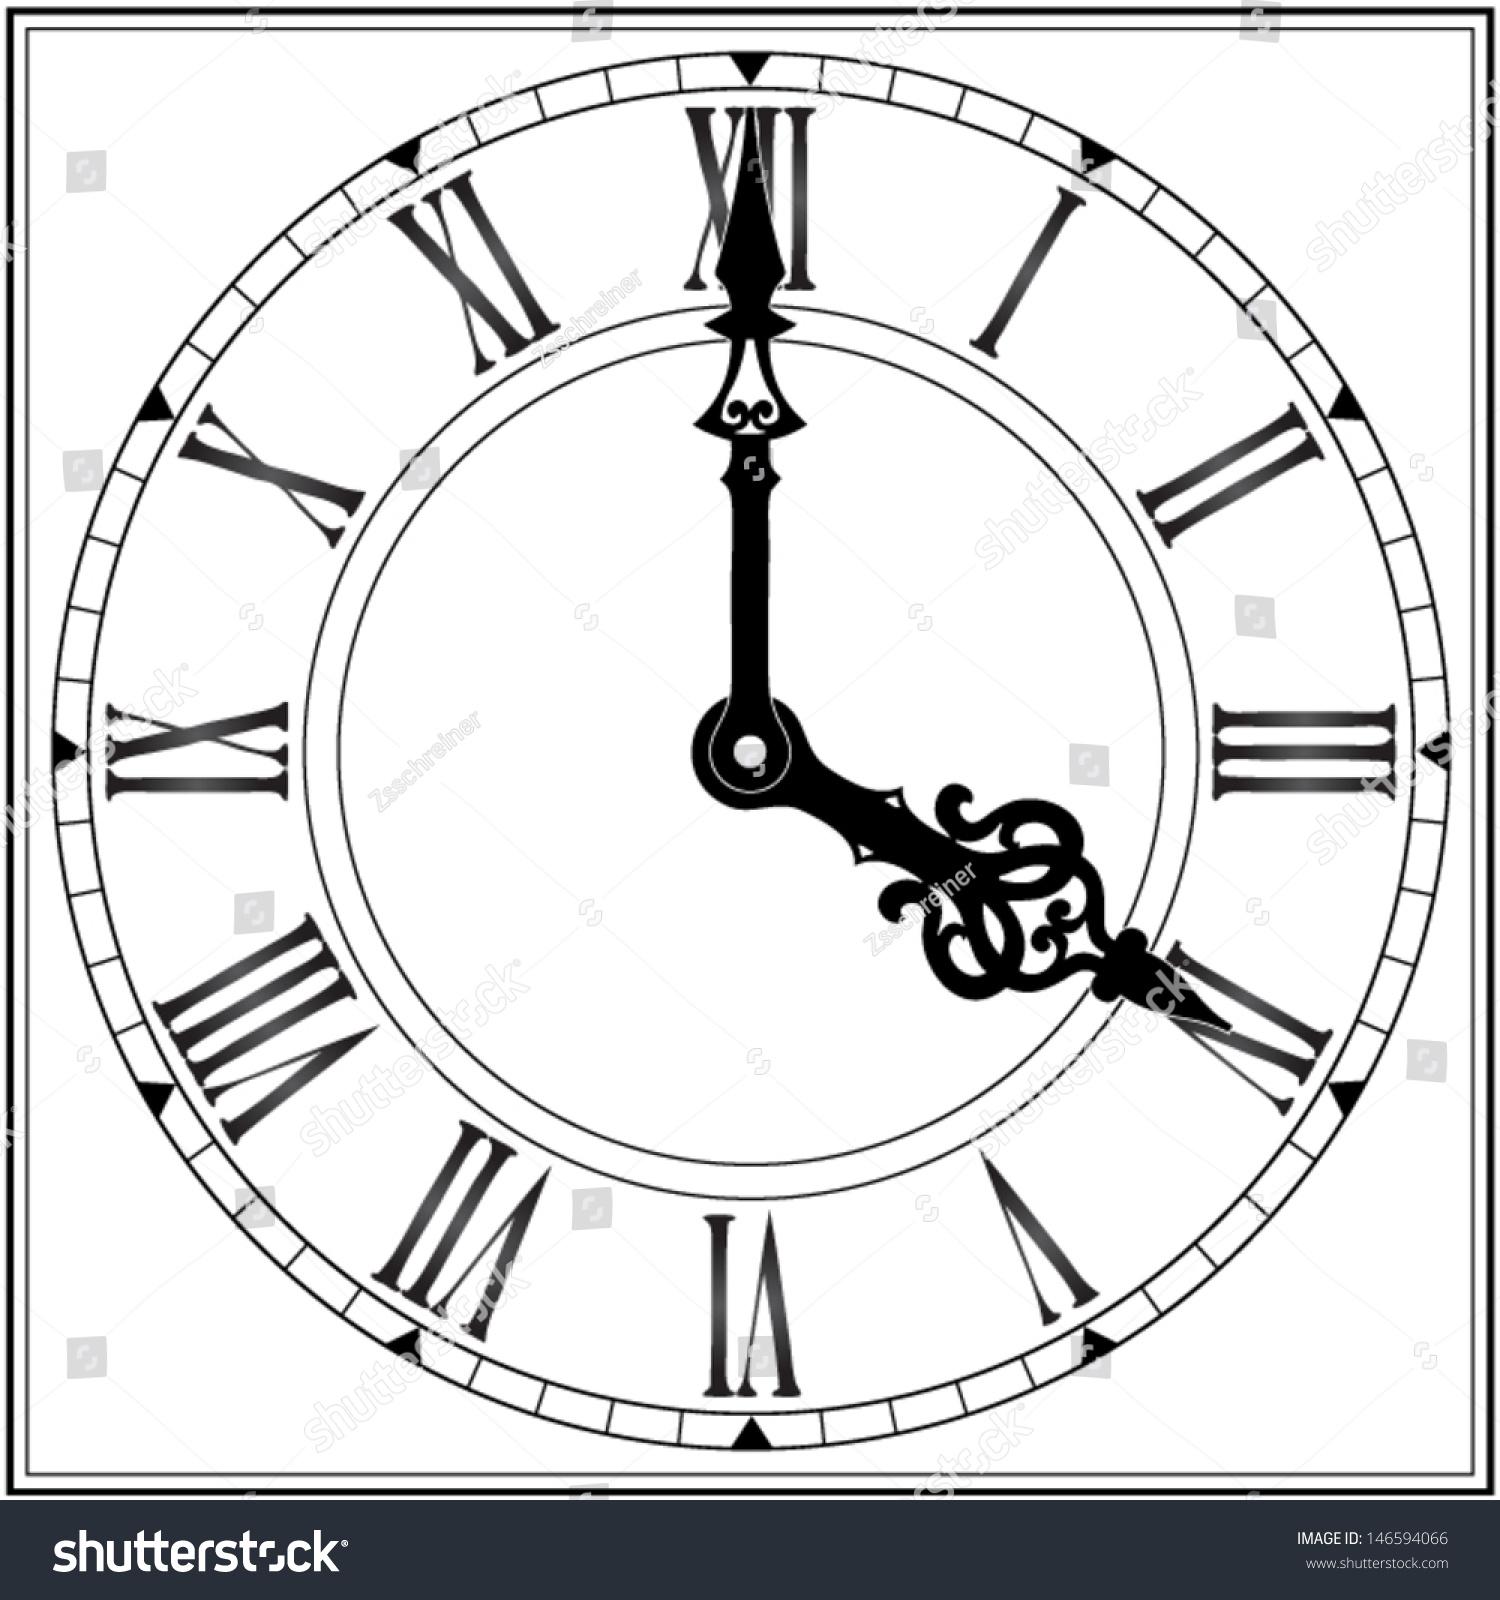 Worksheet Roman Numero elegant roman numeral clock vector illustration stock illustration